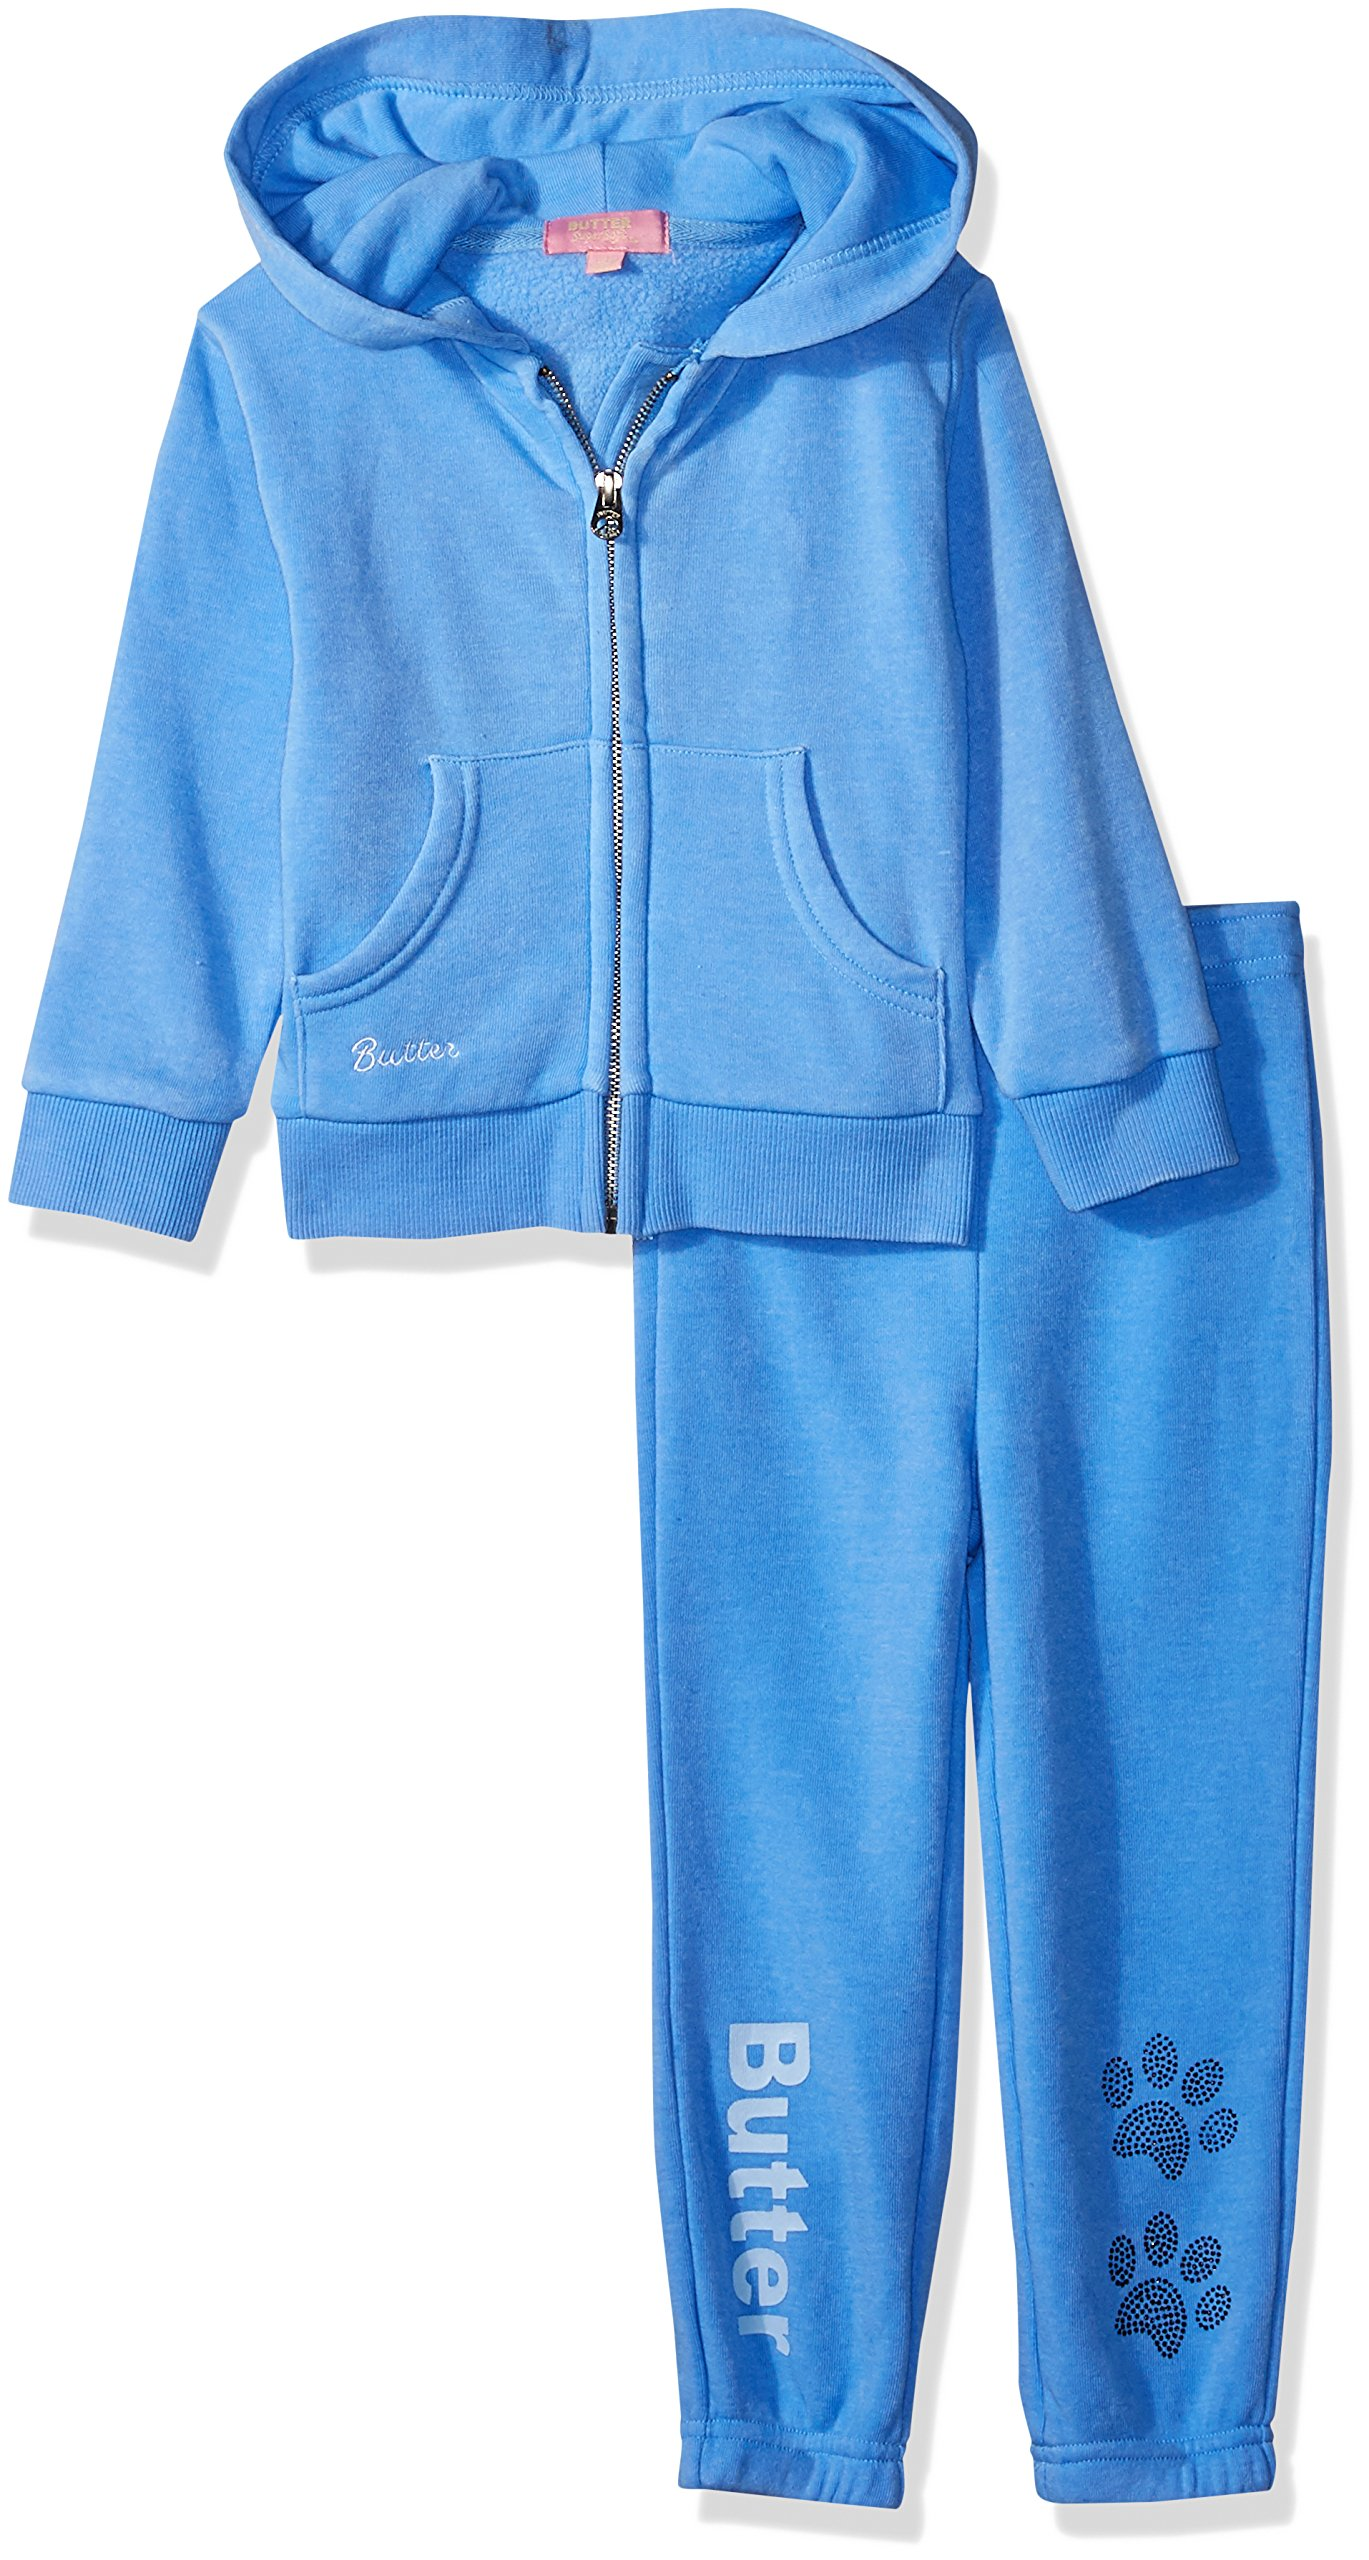 Butter Baby Girls Fleece Set, Della Robbia Blue, 18M by Butter